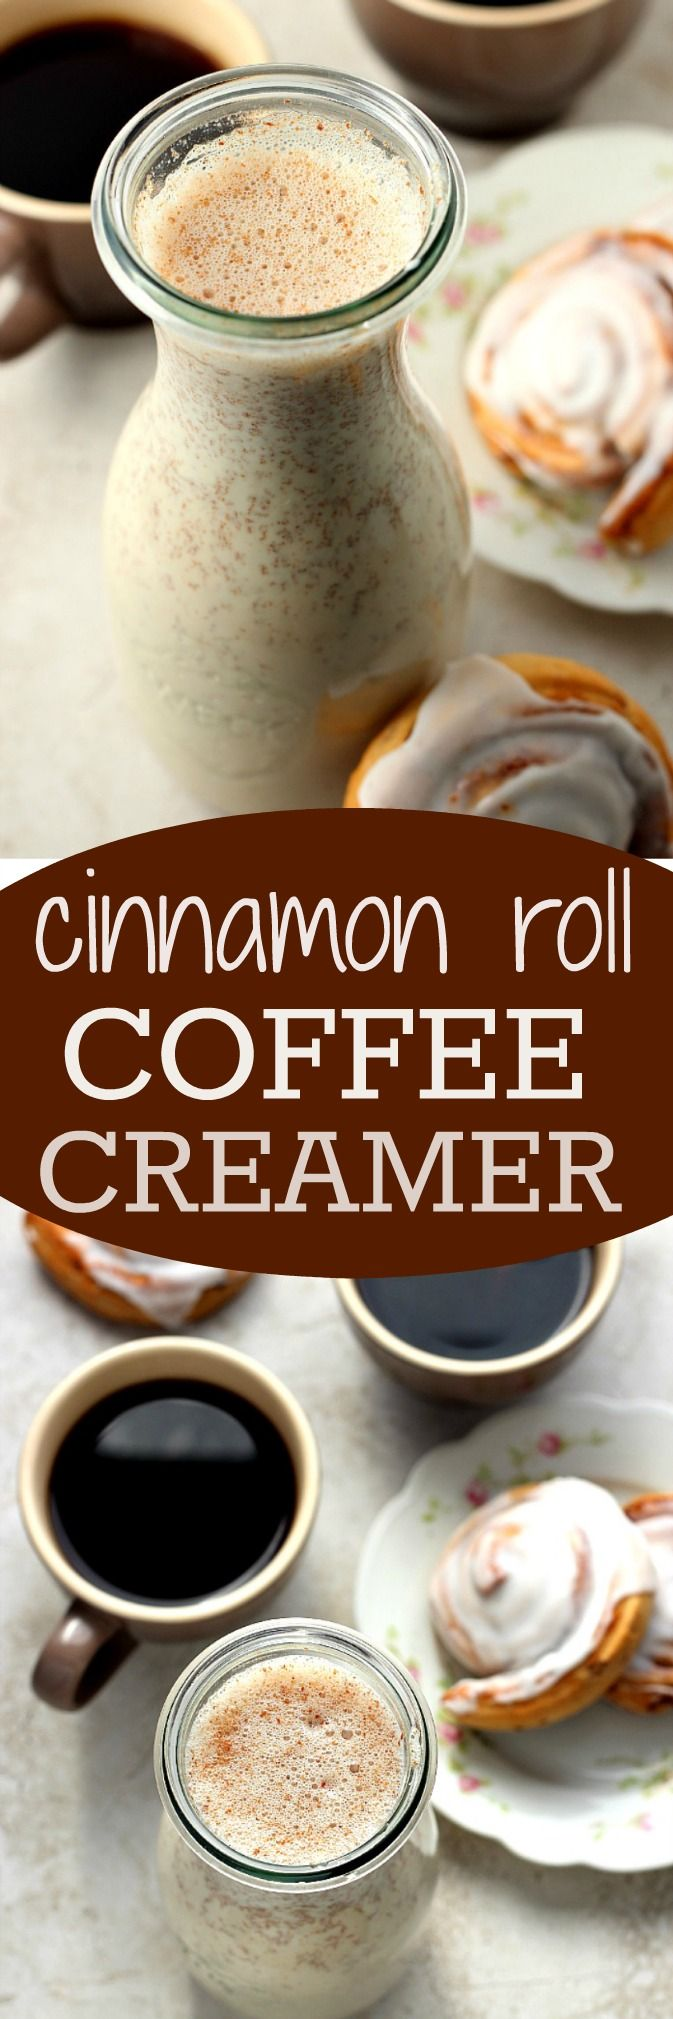 Morning coffee: a few simple recipes 87